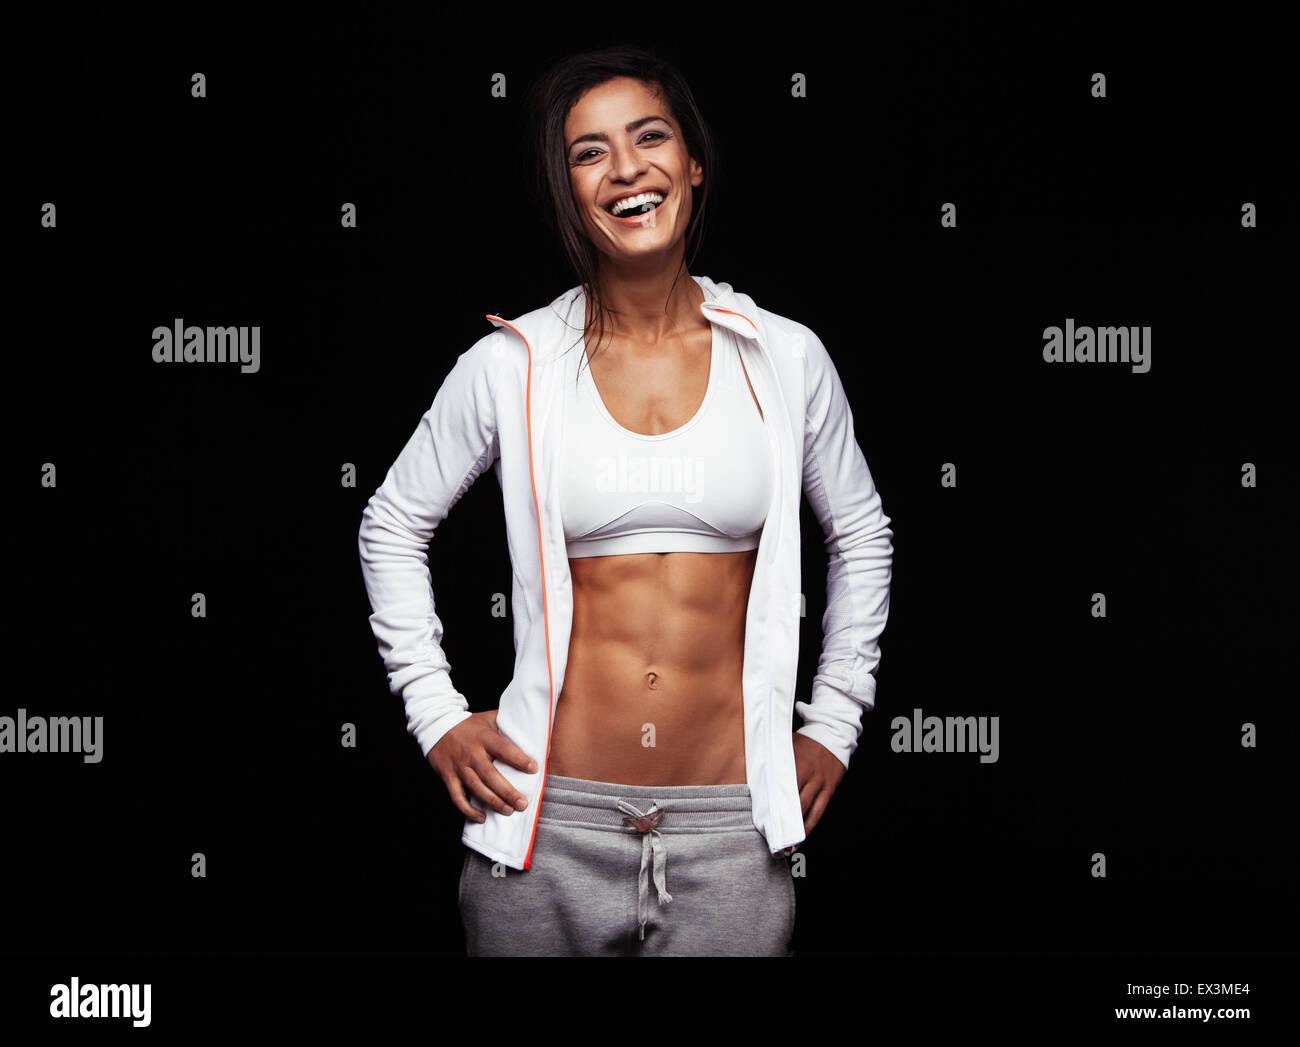 Sonriendo sportswoman en ropa deportiva sobre fondo negro. Modelo de fitness caucásica mirando feliz con ella Imagen De Stock